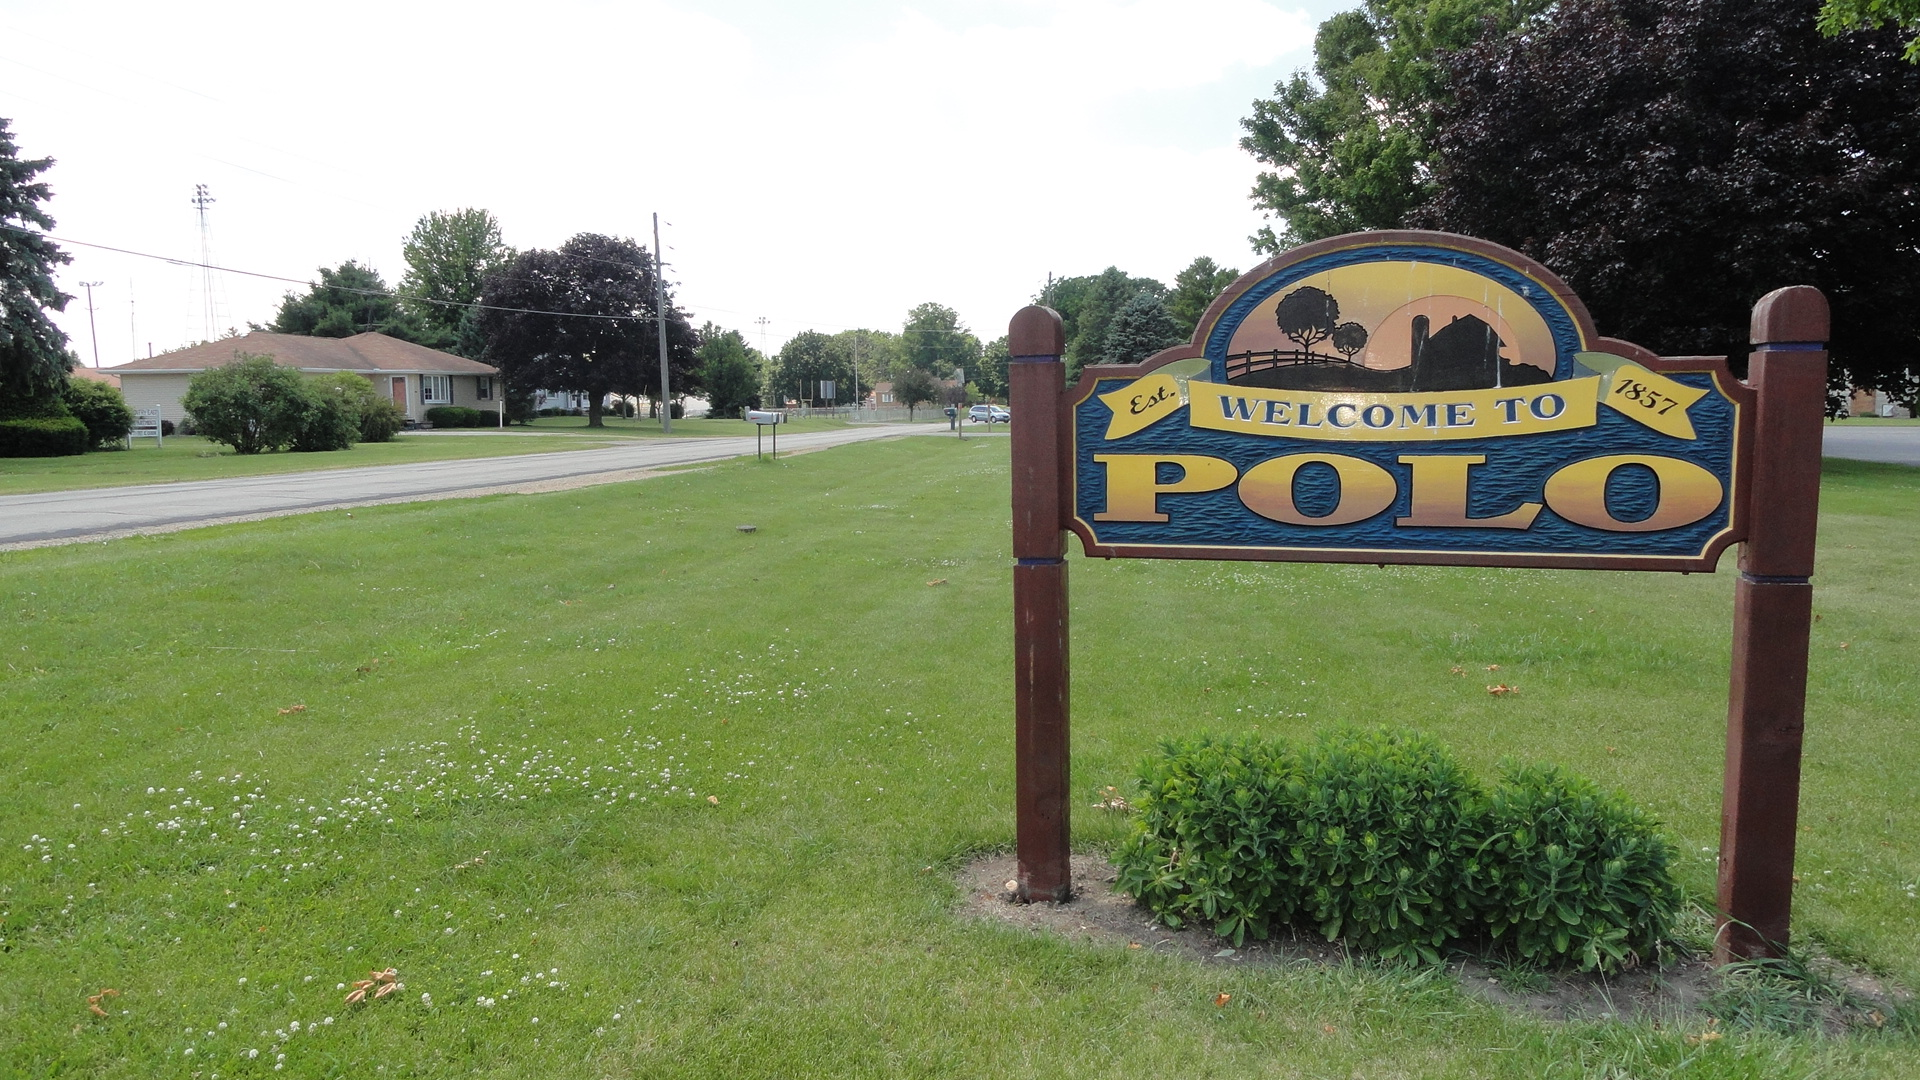 Illinois ogle county polo - Illinois Ogle County Polo 85